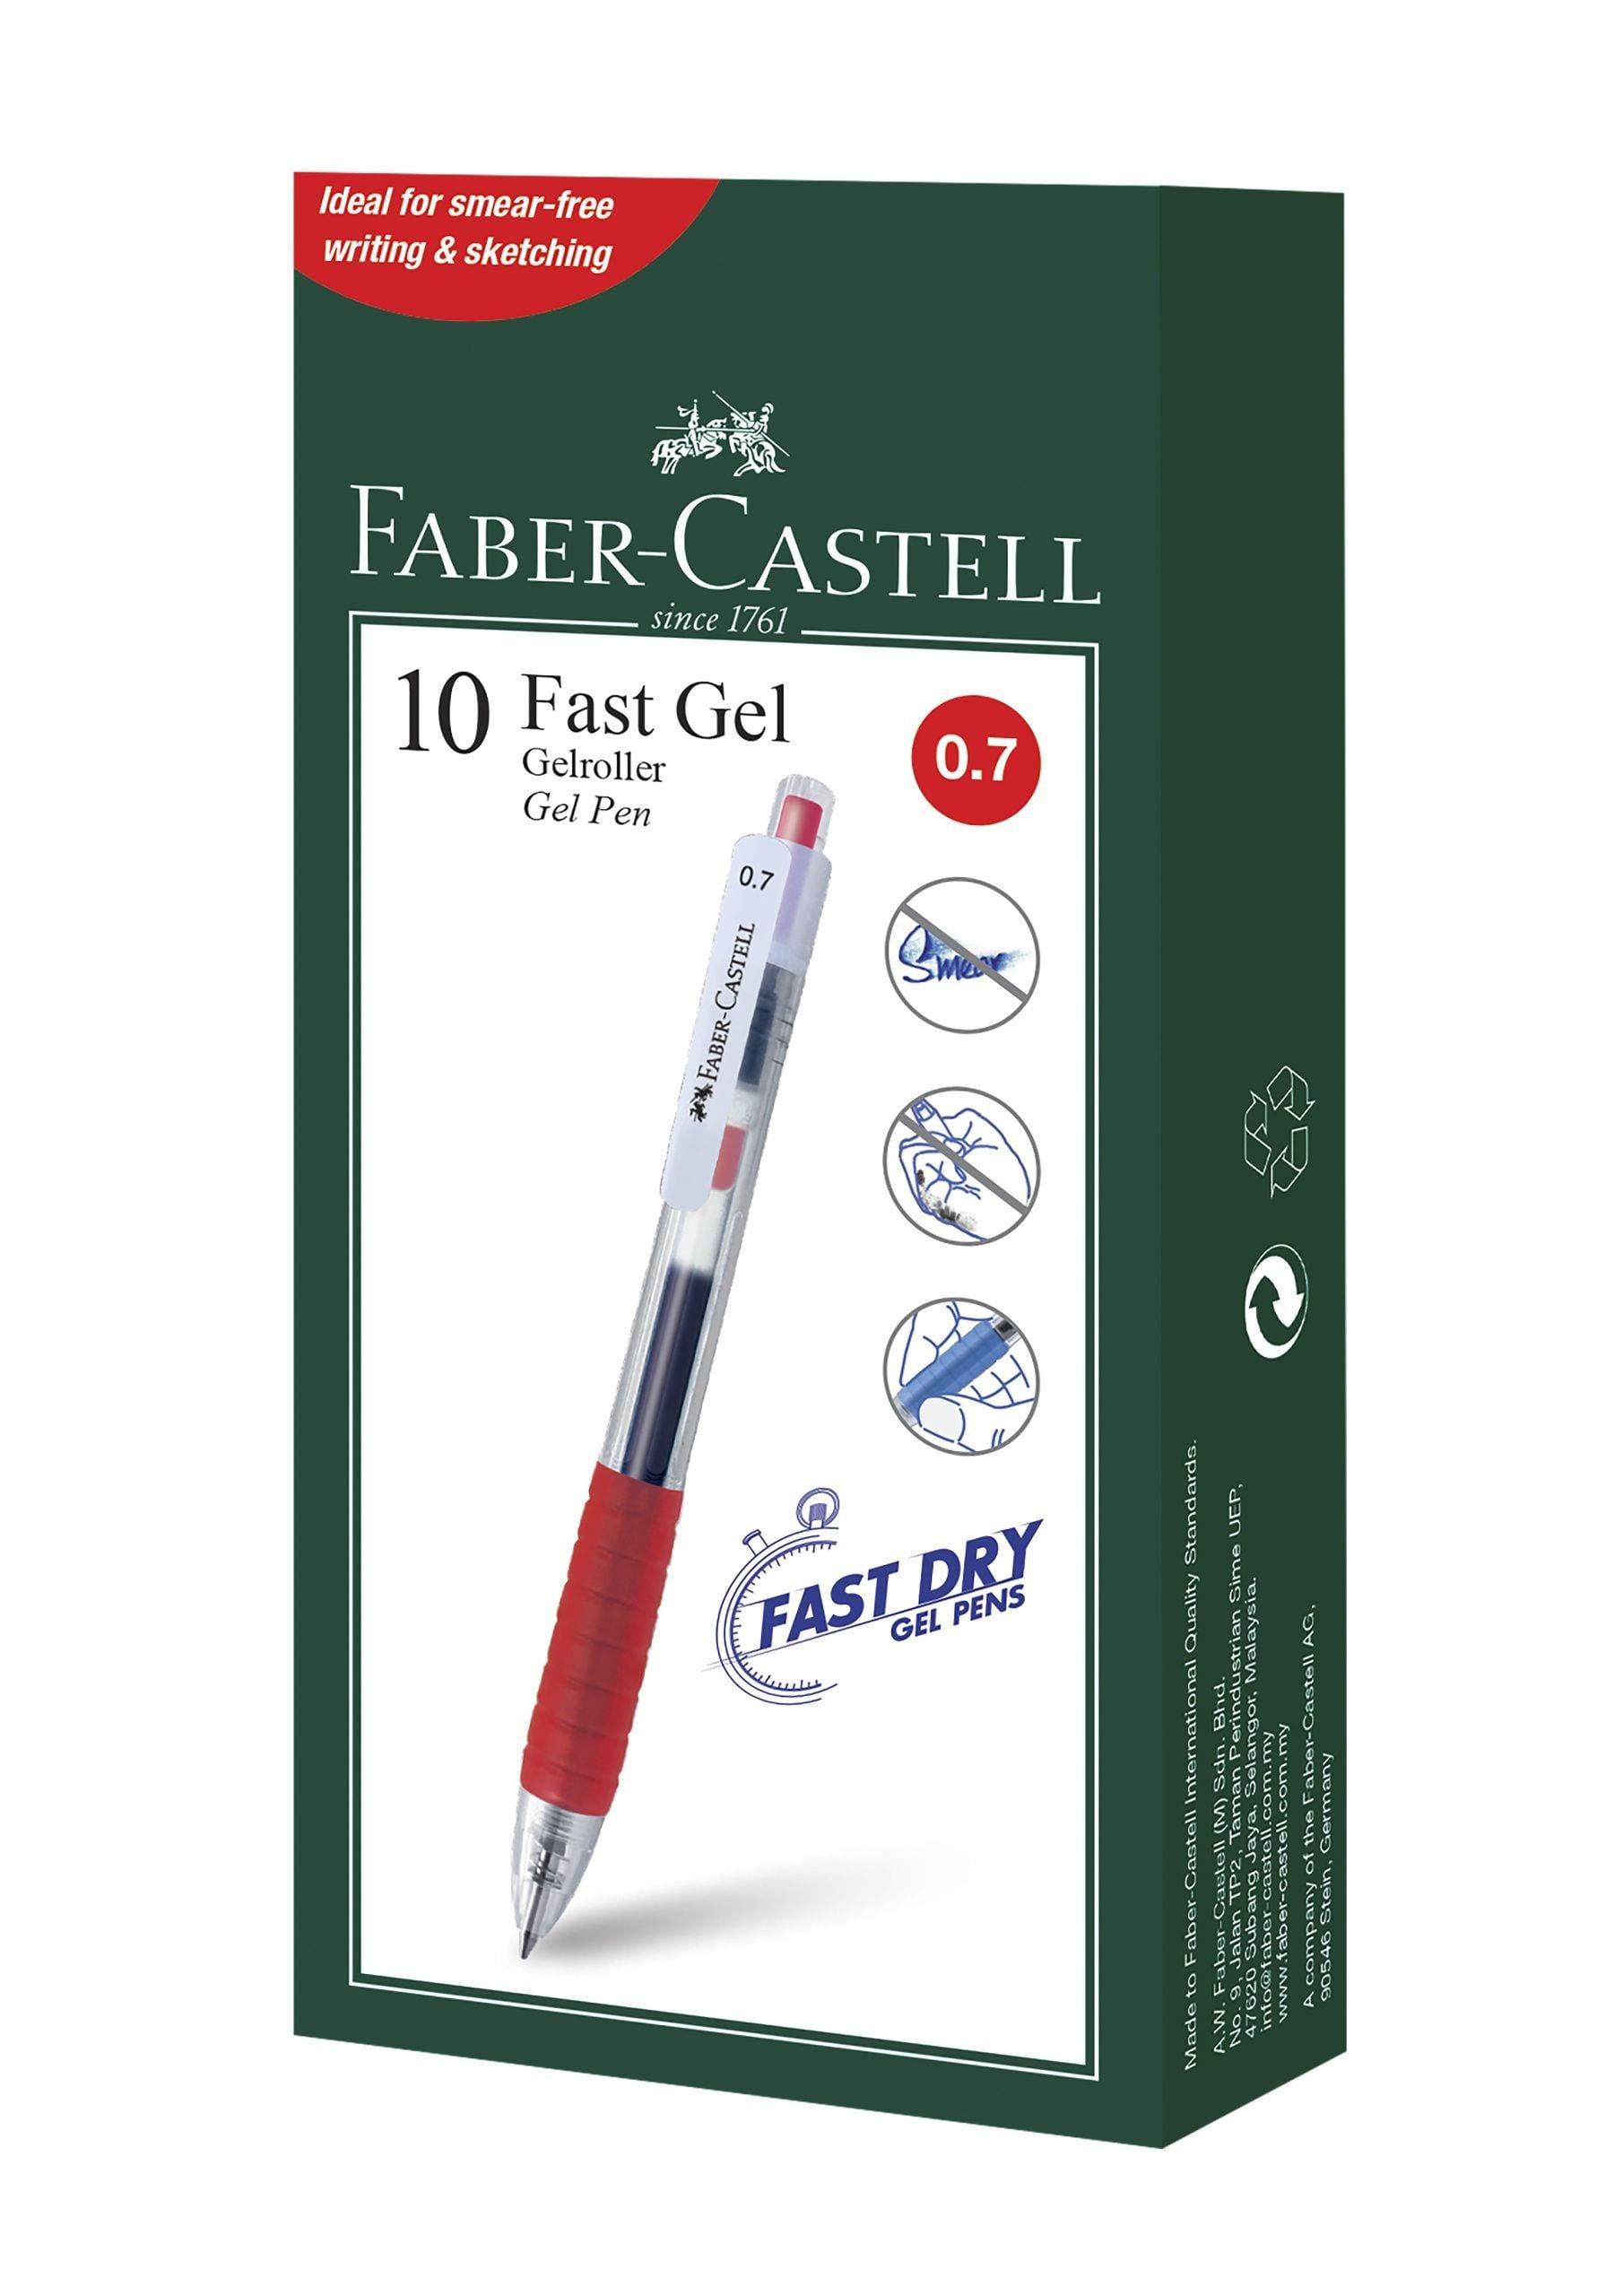 PIX CU GEL 0.7MM FAST GEL ROSU FABER-CASTELL